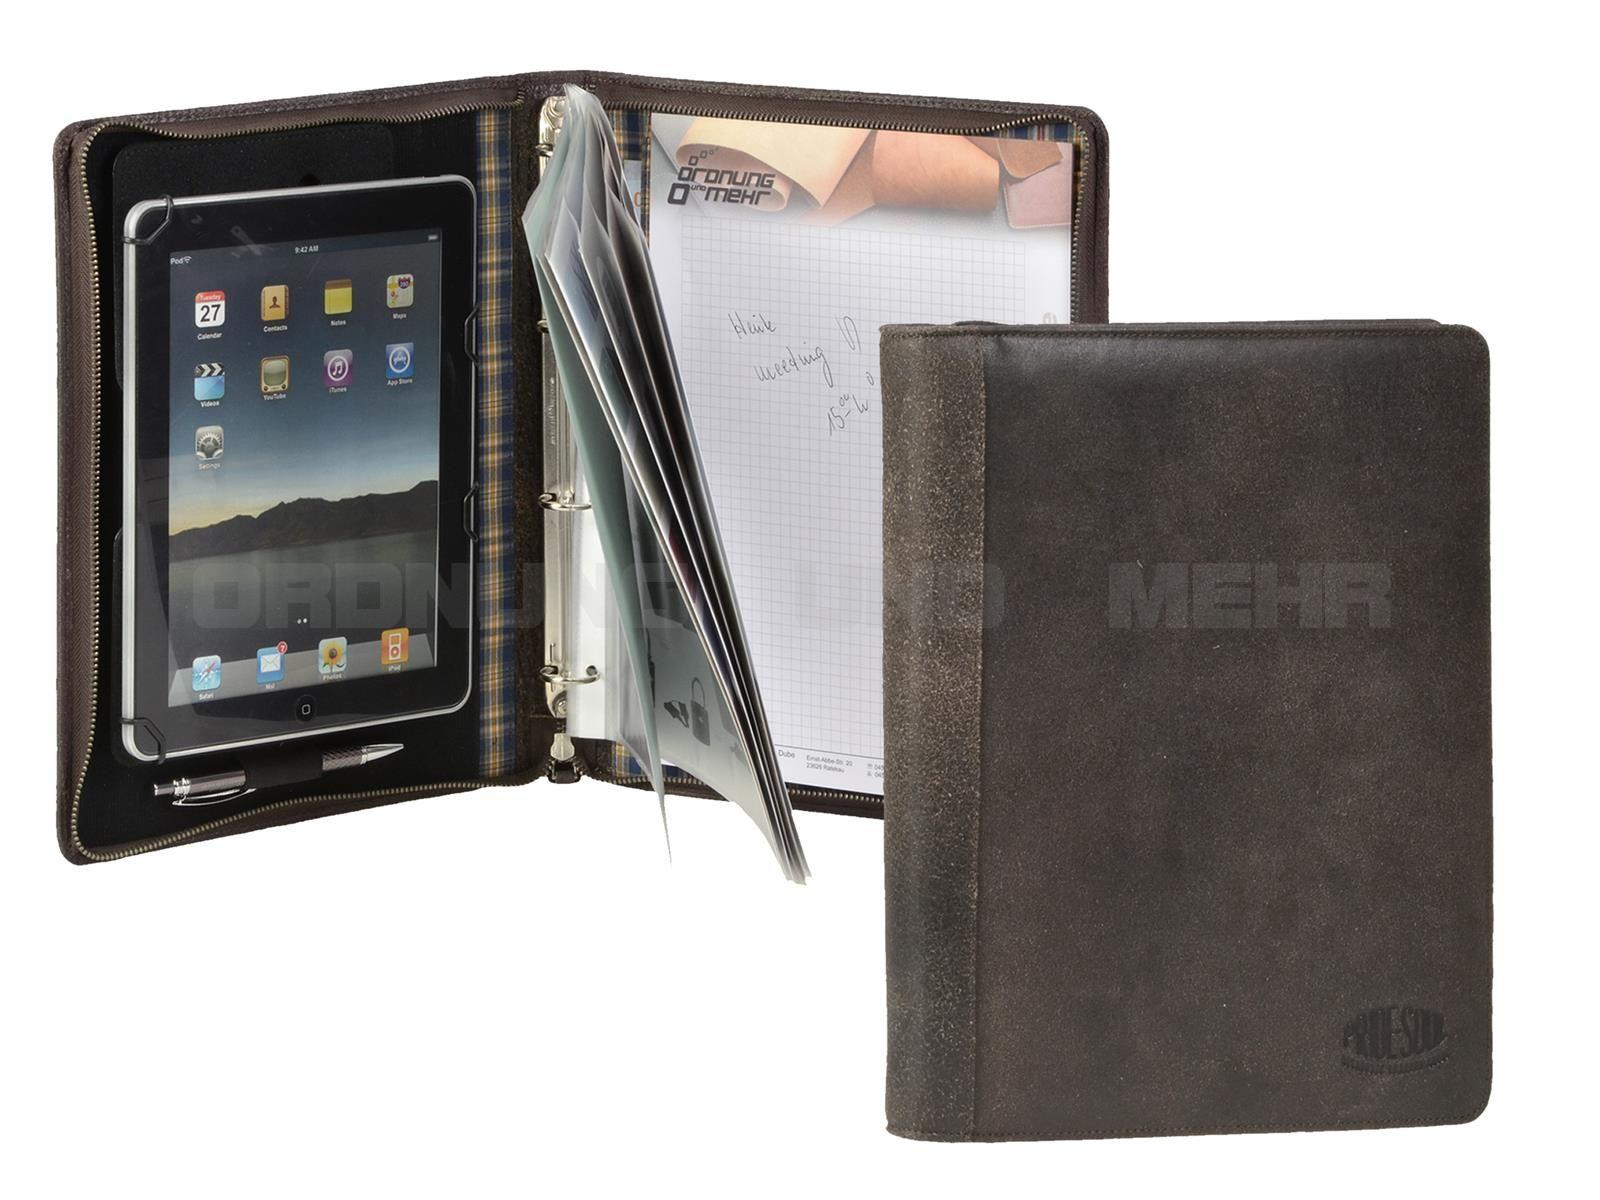 85204b6ad2306 PRIDE   SOUL - Leder A4 Orgamappe universelle Tablet-Mappe Ringbuchmappe  Schreibmappe - braun